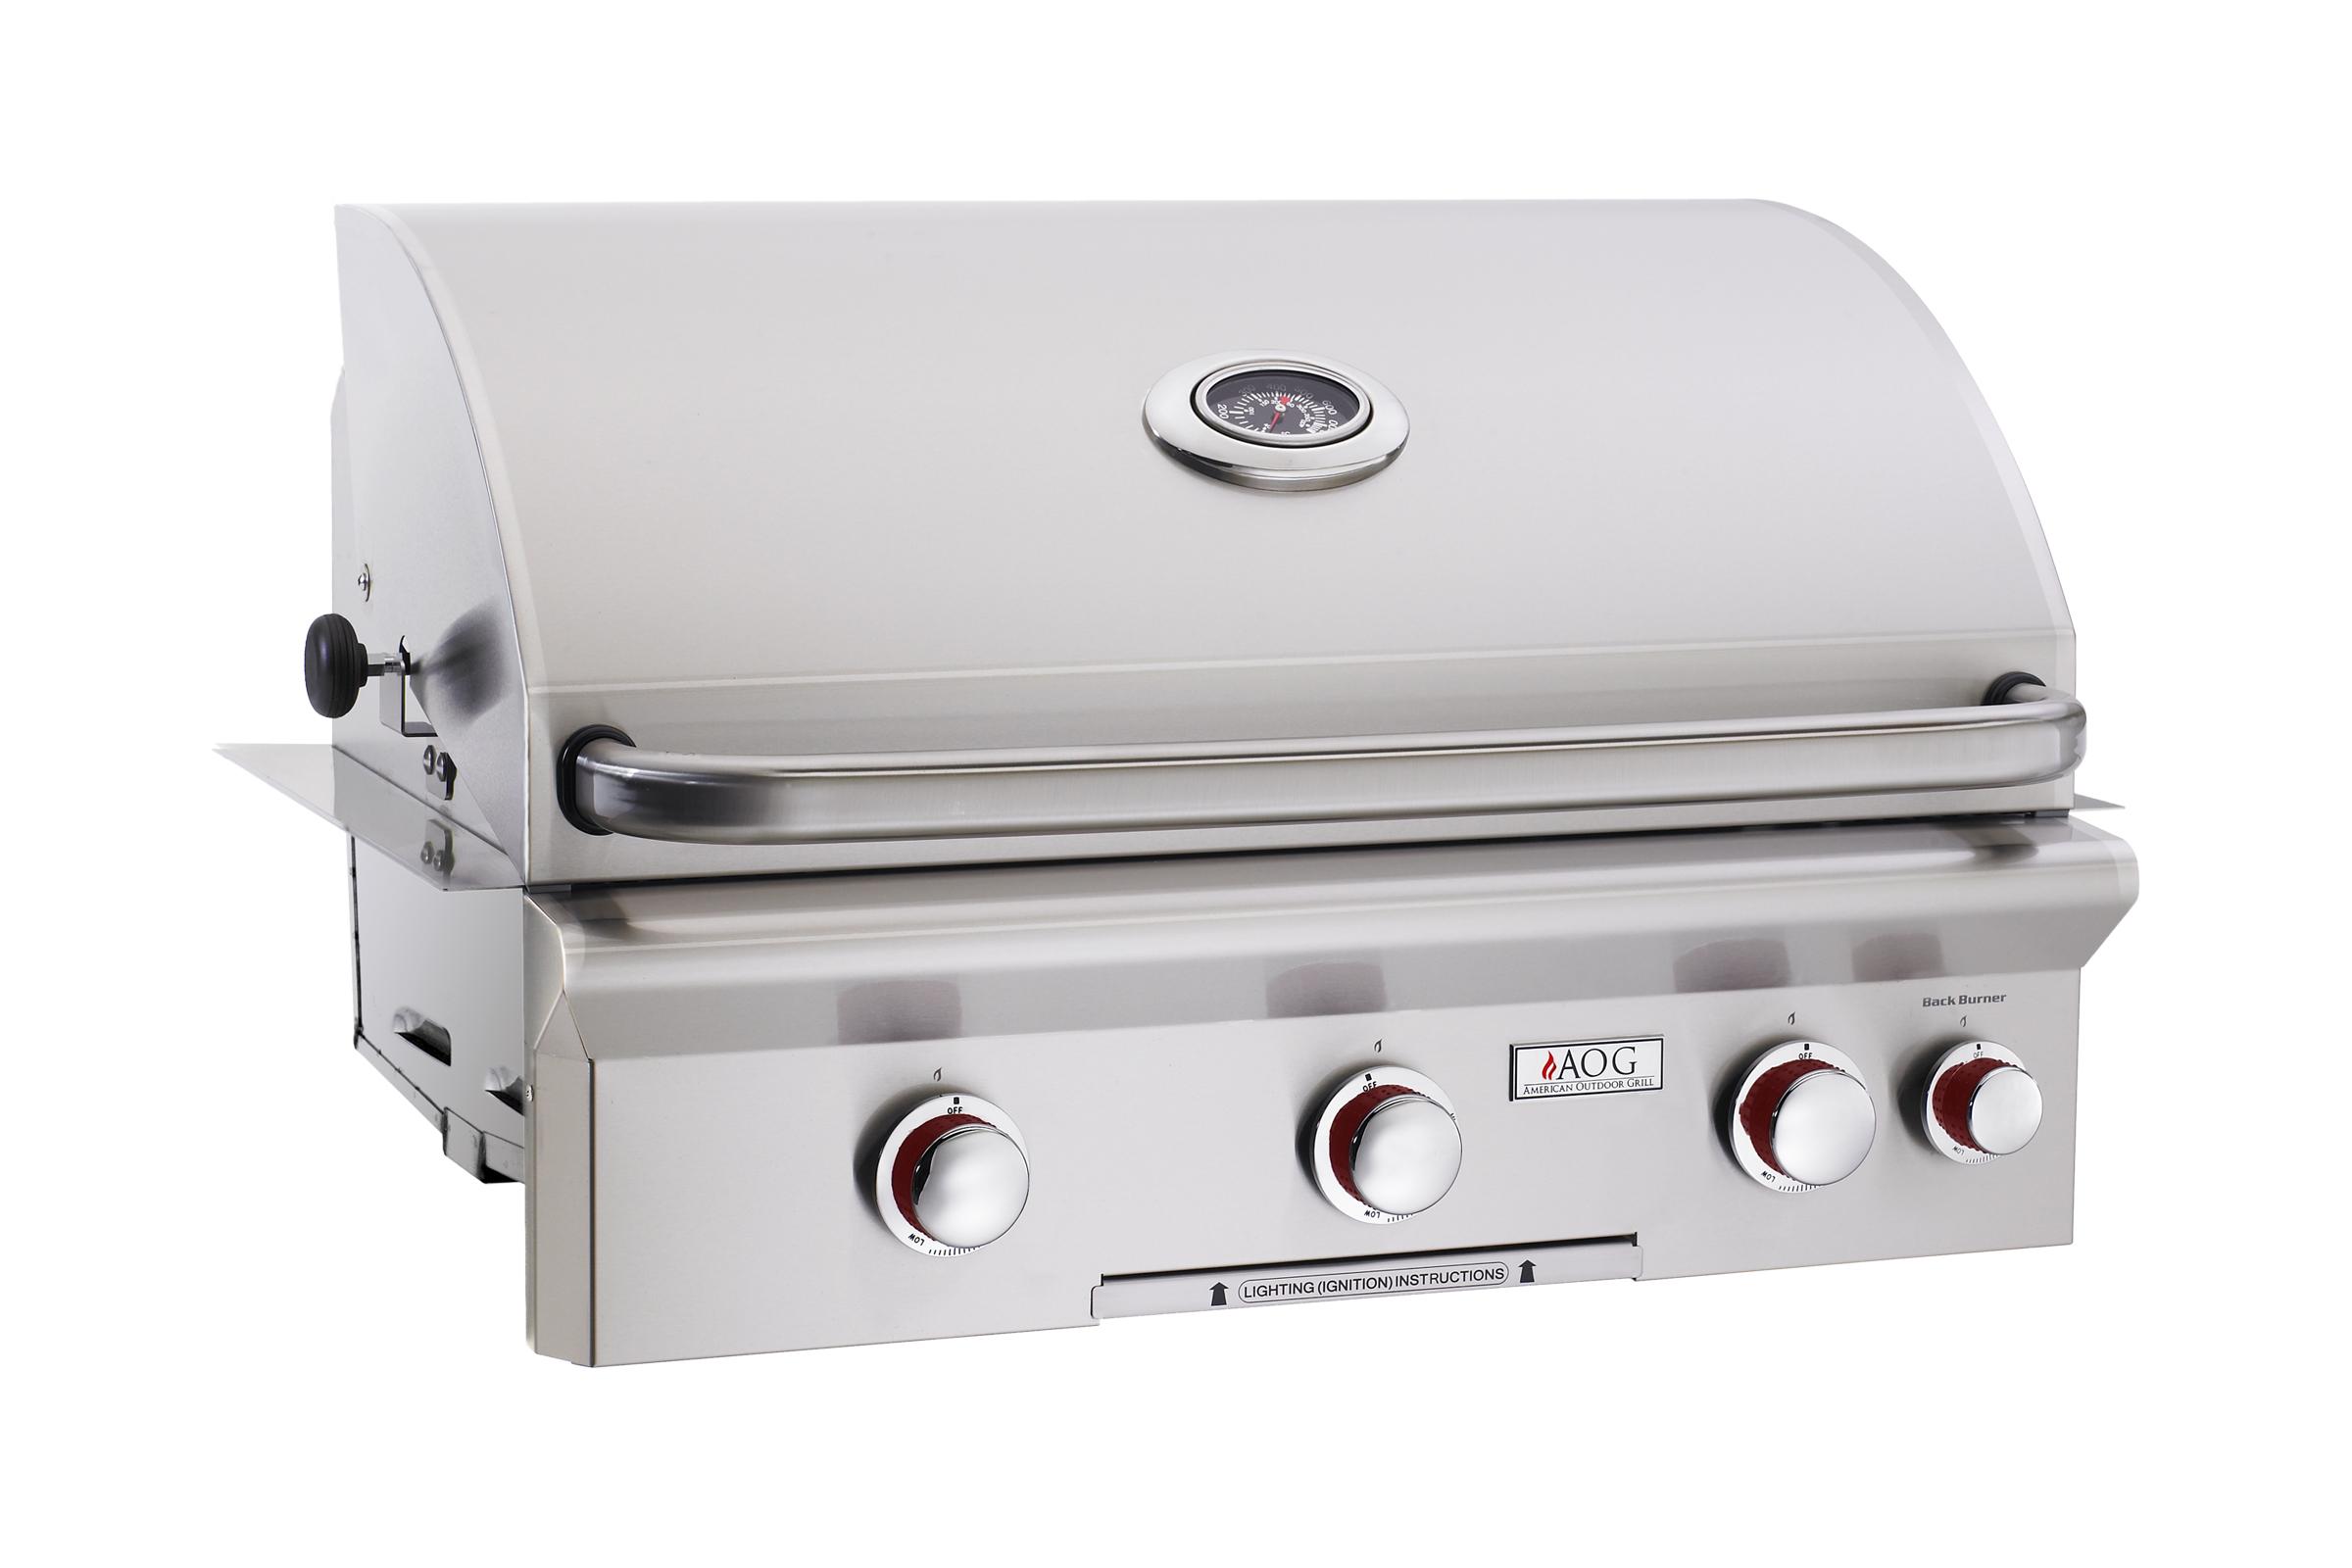 aog-30nbt-30-t-series-built-in-grill.jpg